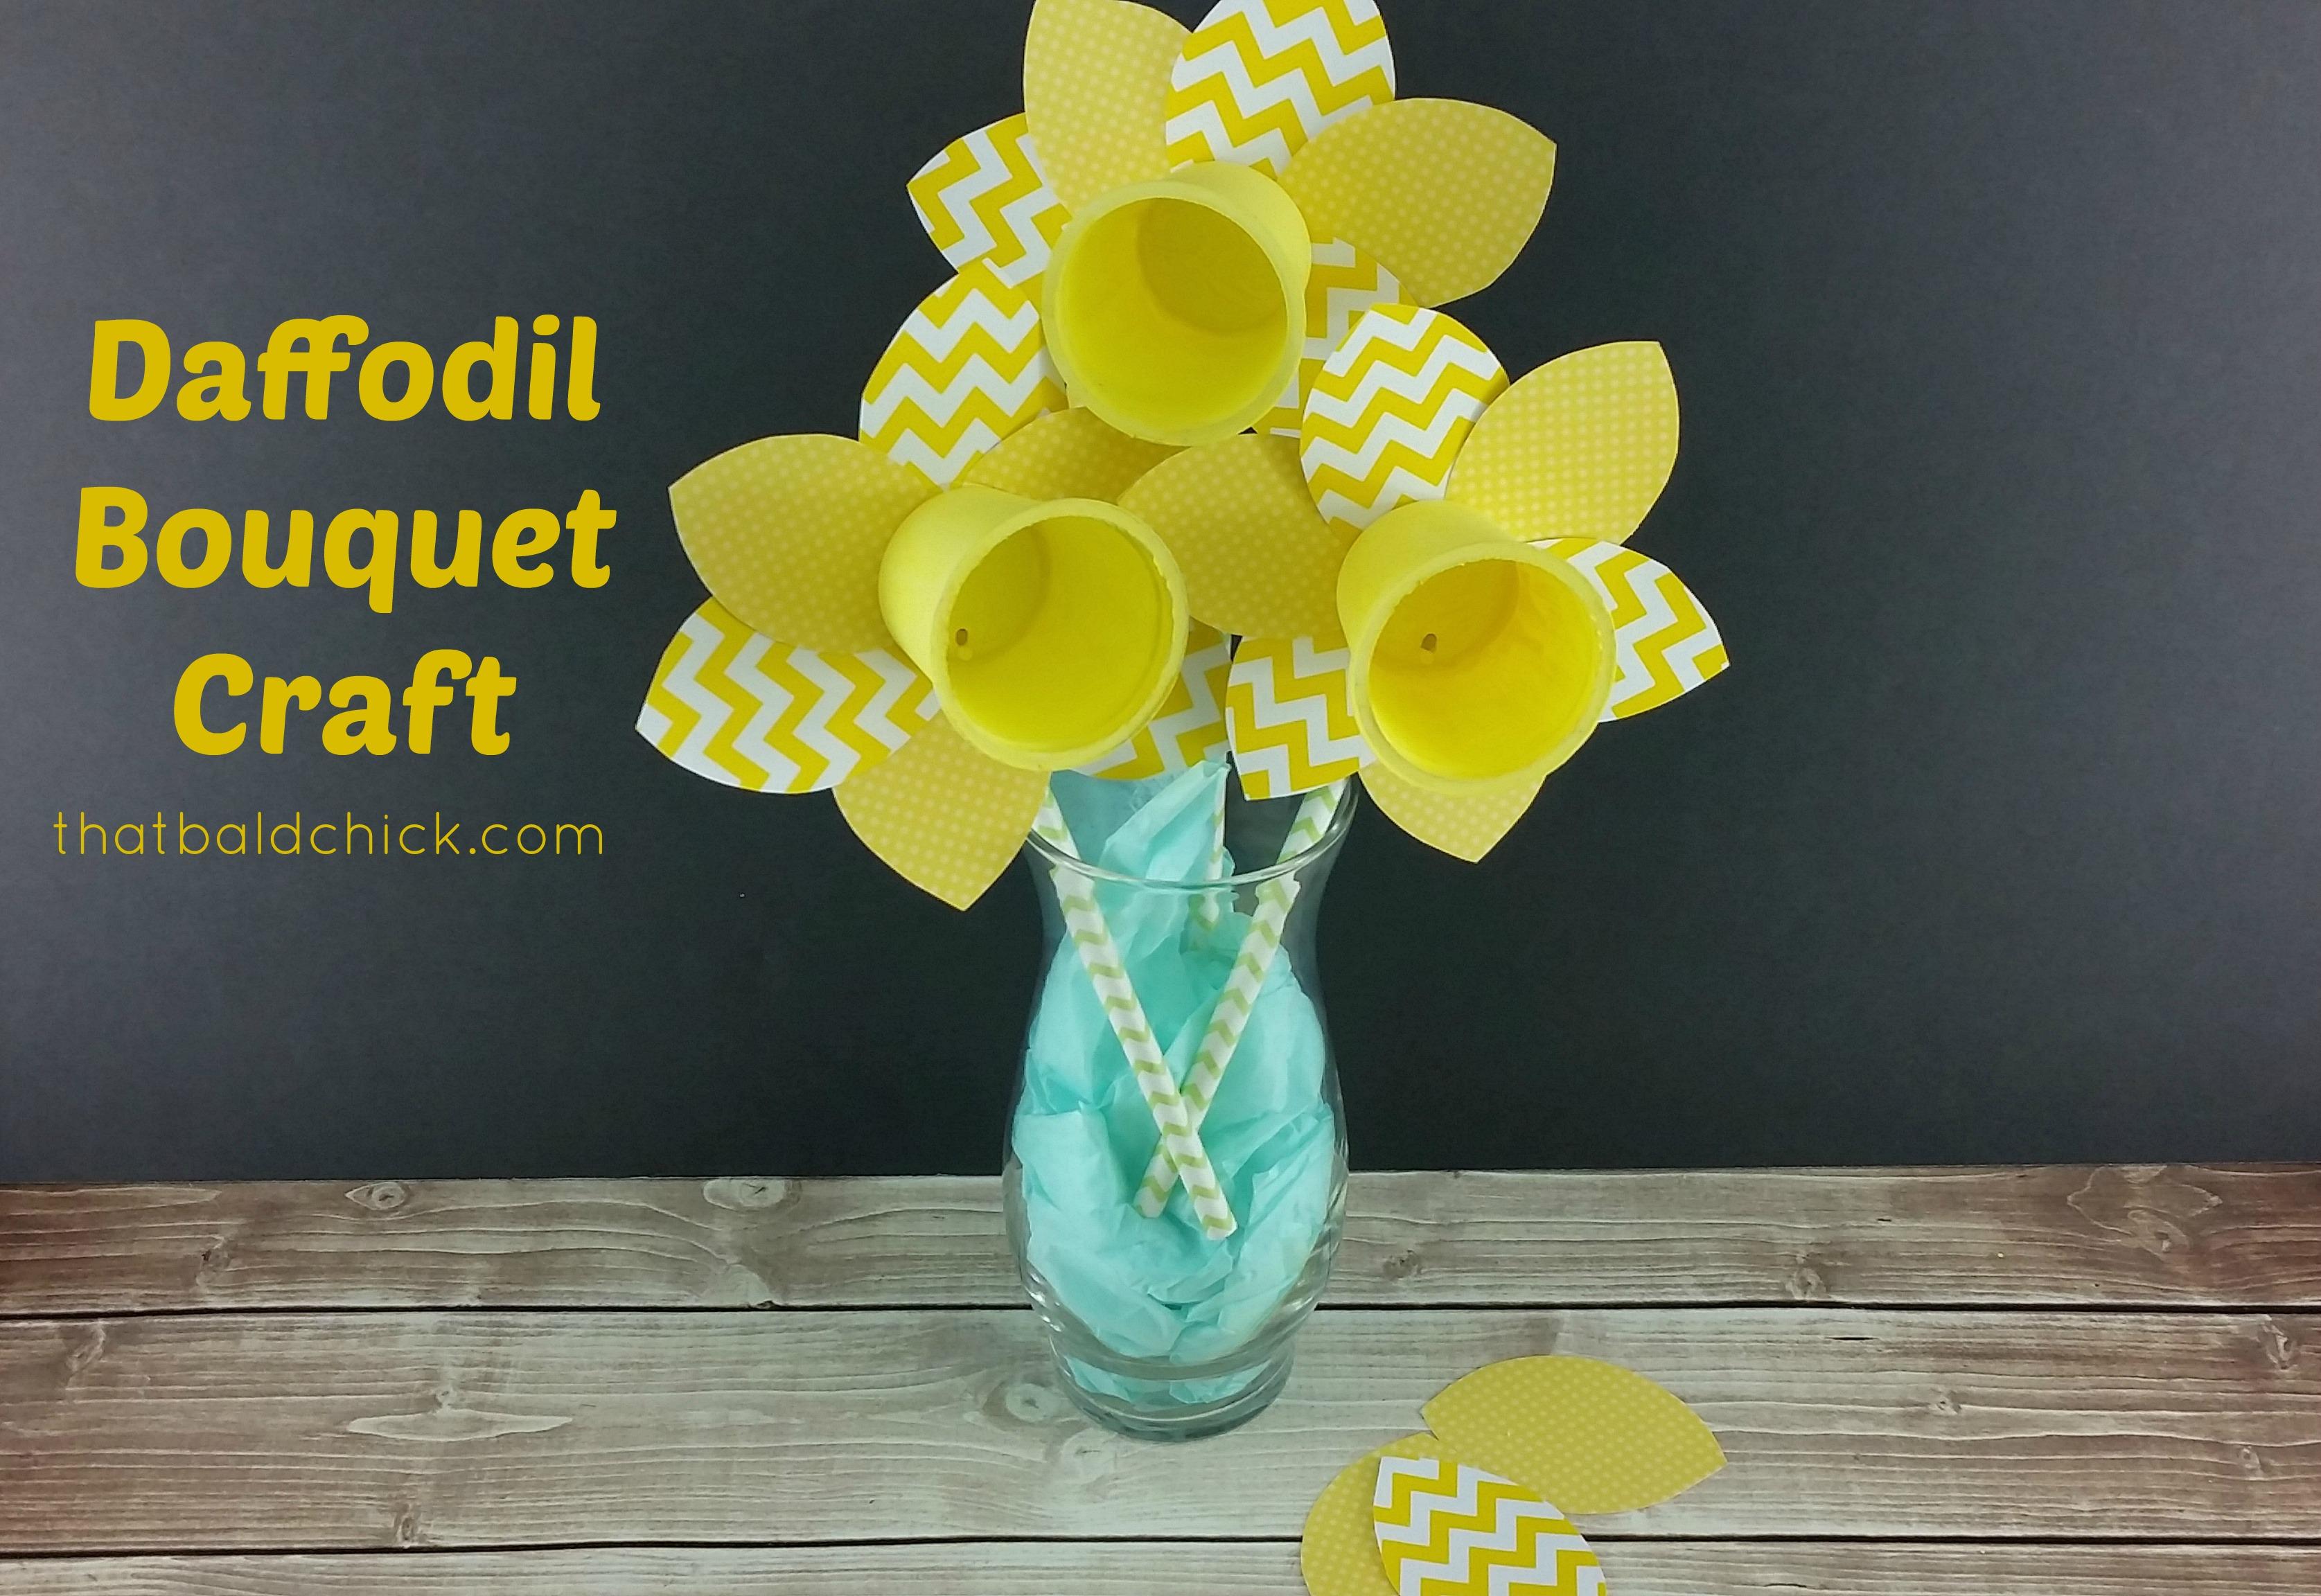 Daffodil Bouquet Craft at thatbaldchick.com